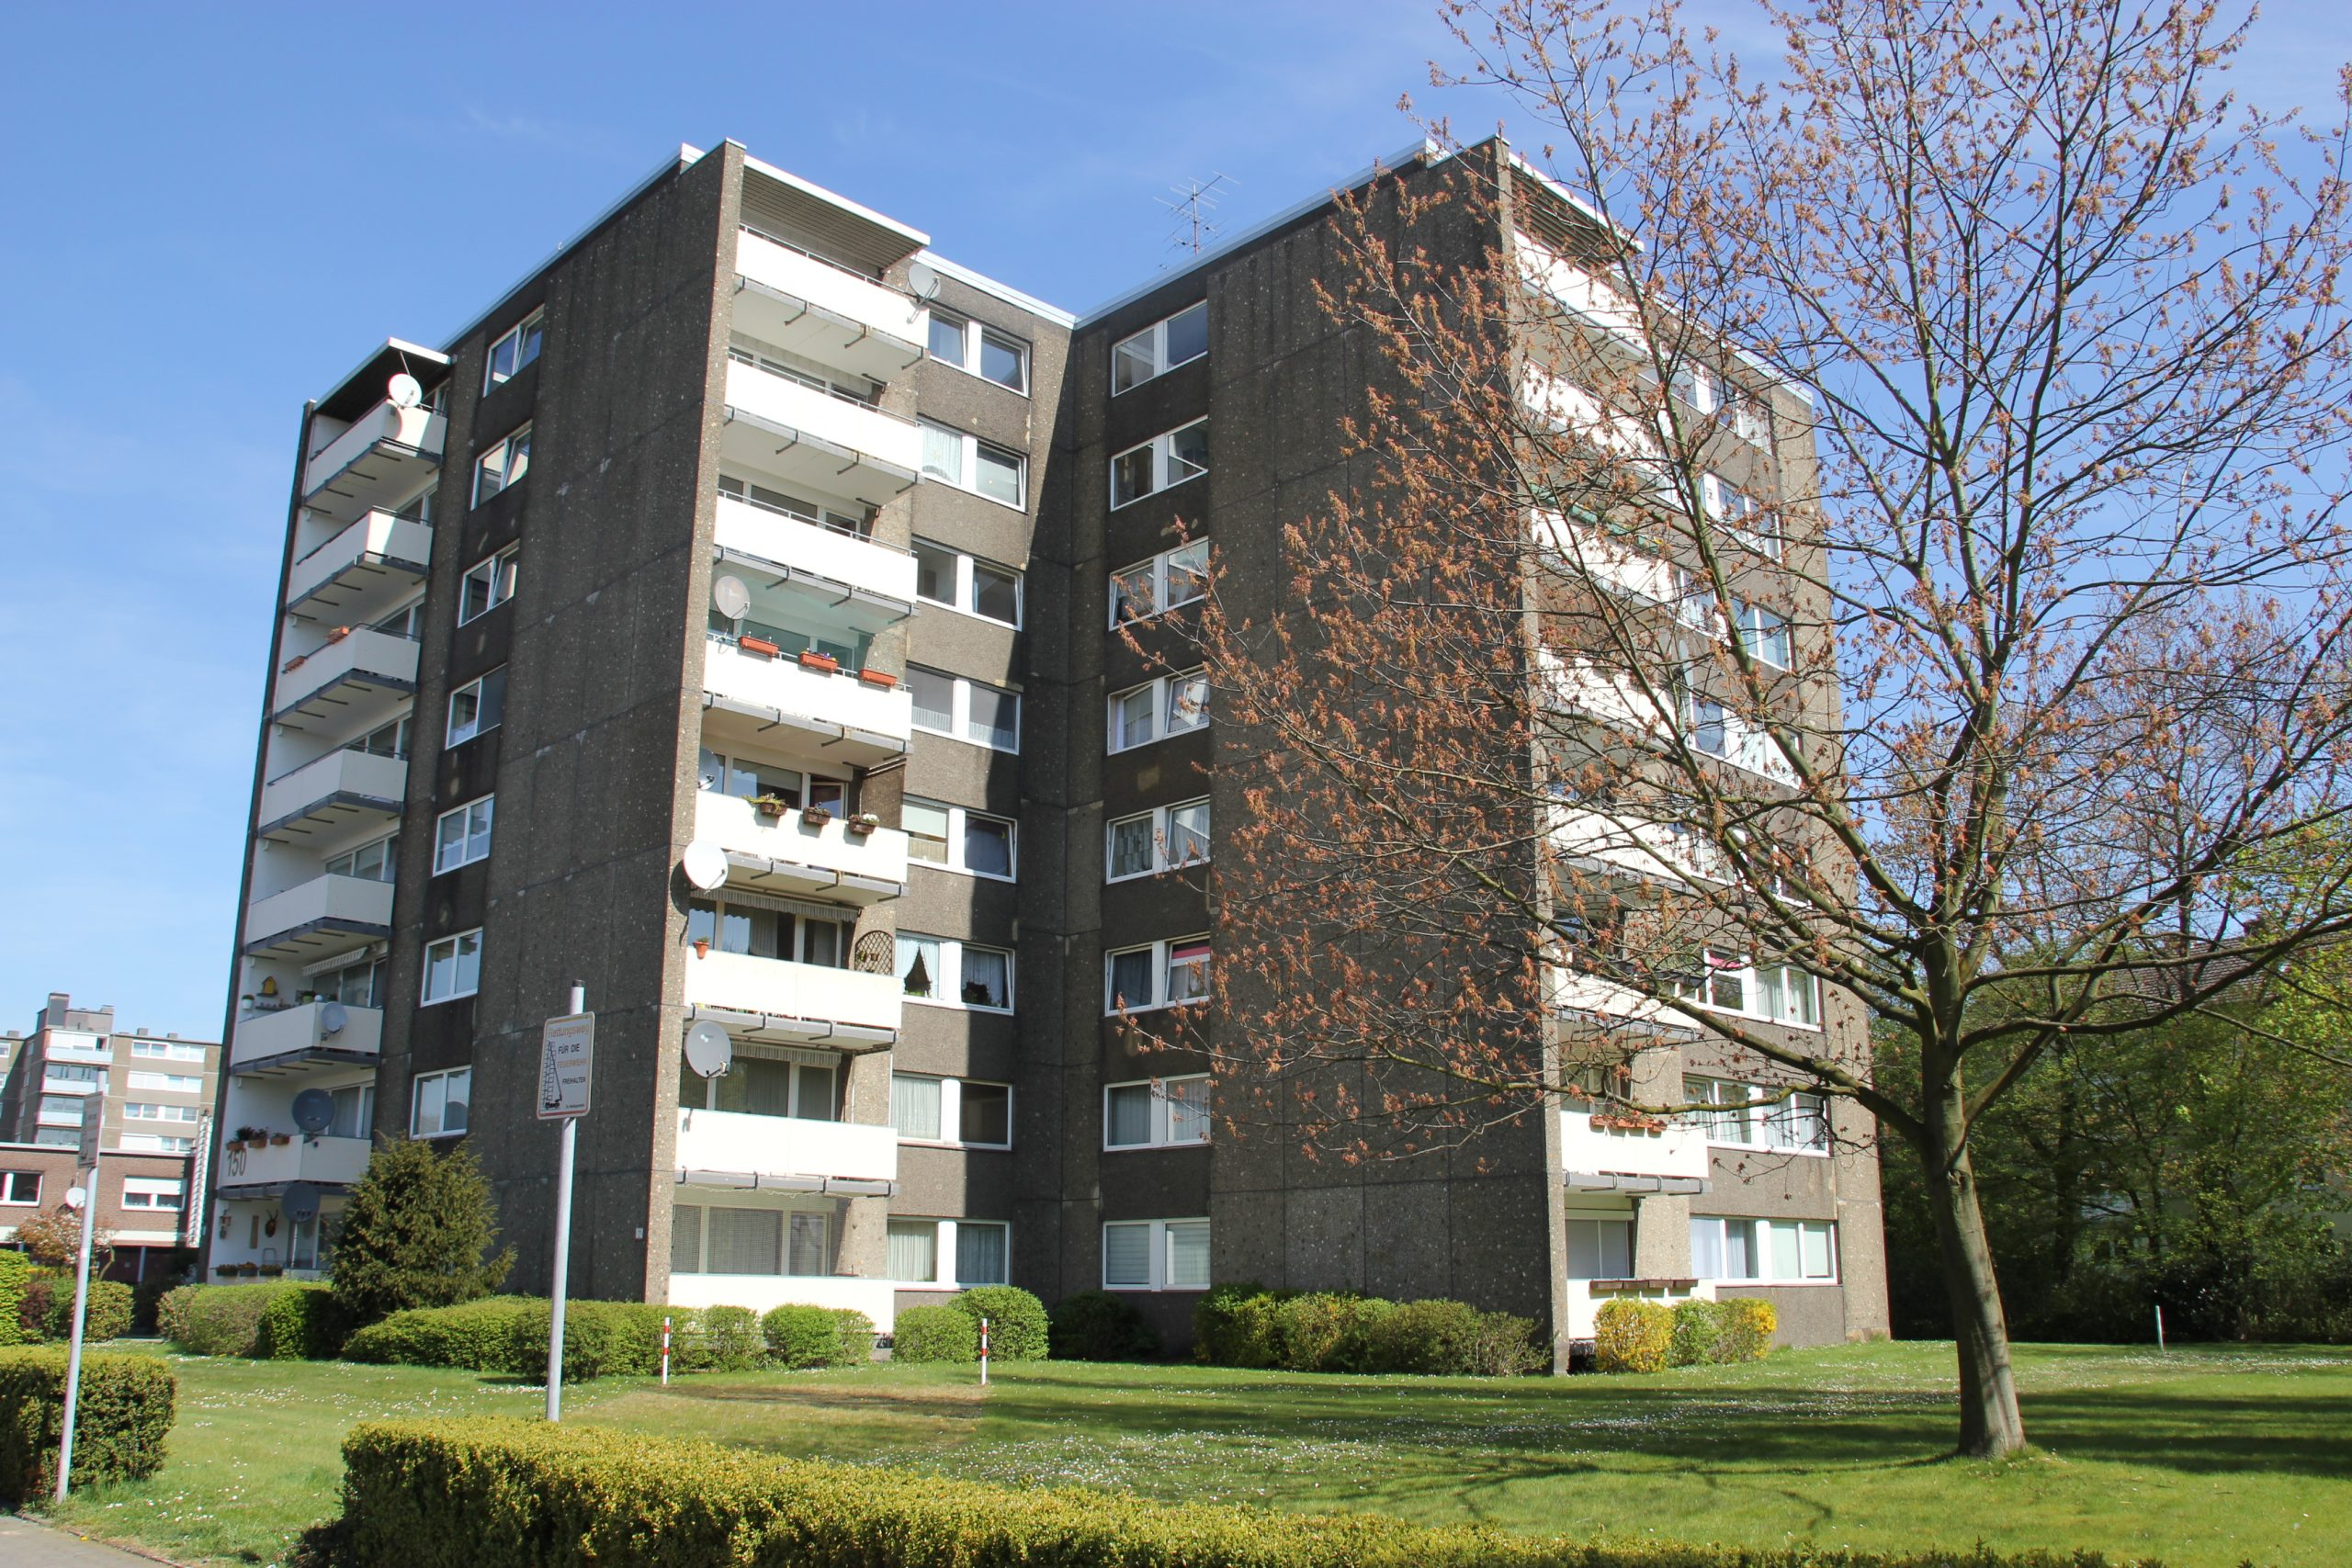 Hausverwaltung Krefeld - Gatherhofstraße - WEG-Verwalter